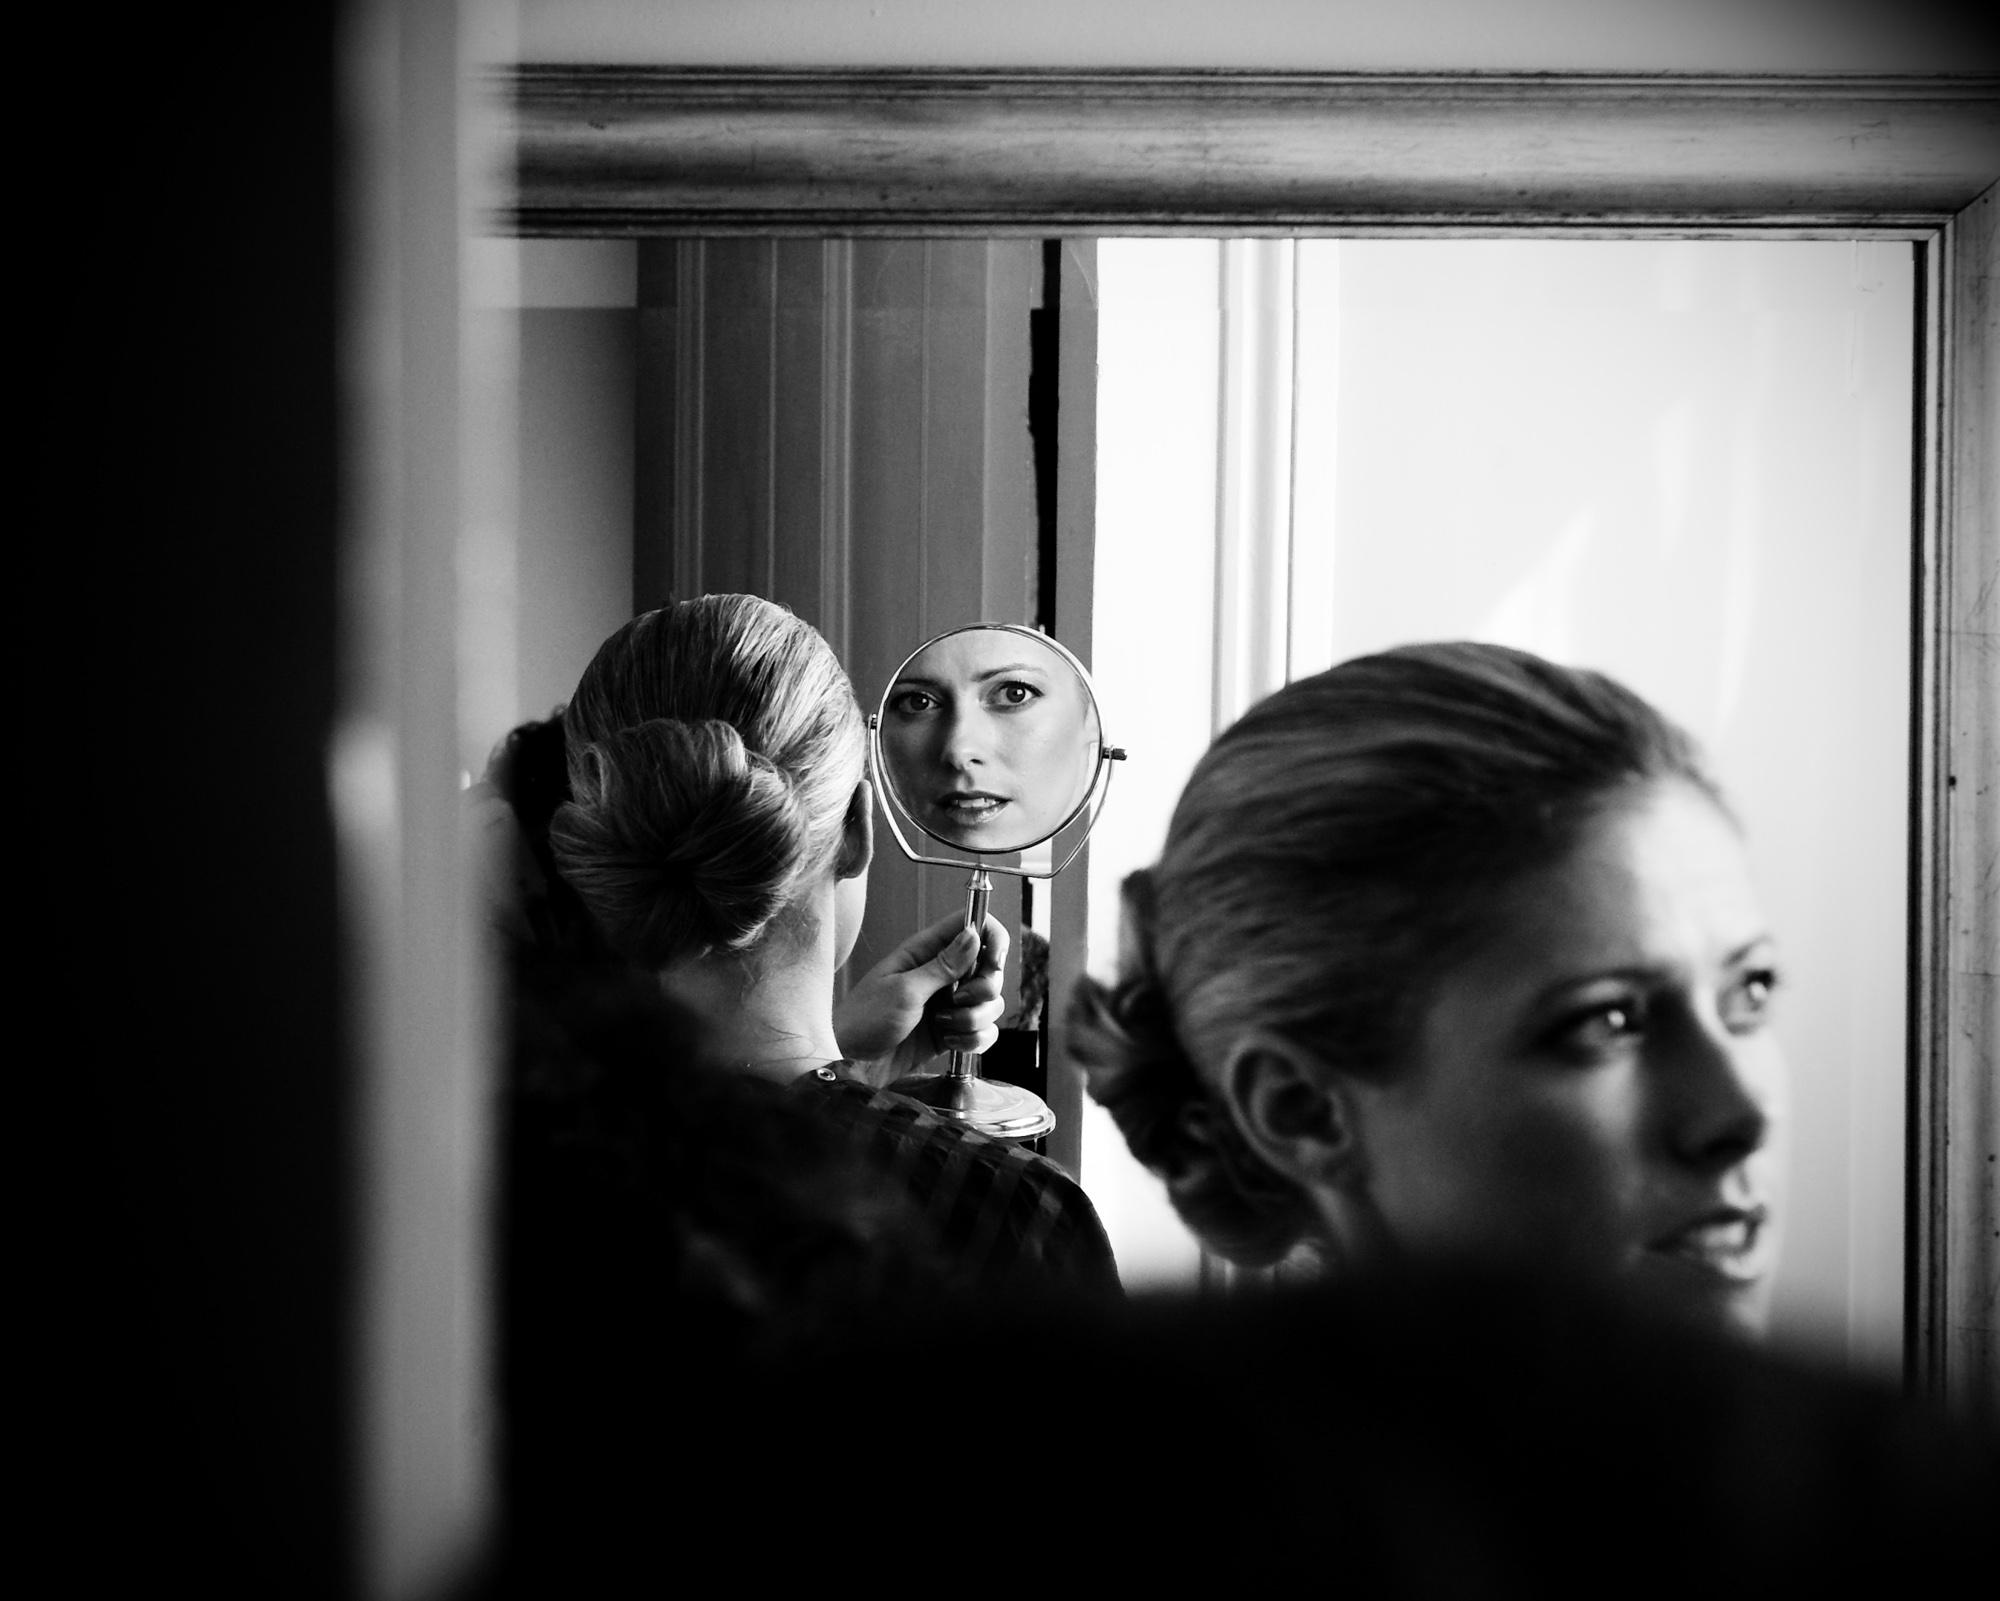 Scott-Myers-Photography-WeddingScott-Myers-Photography-WeddingPortfolio-Candids-25.jpg